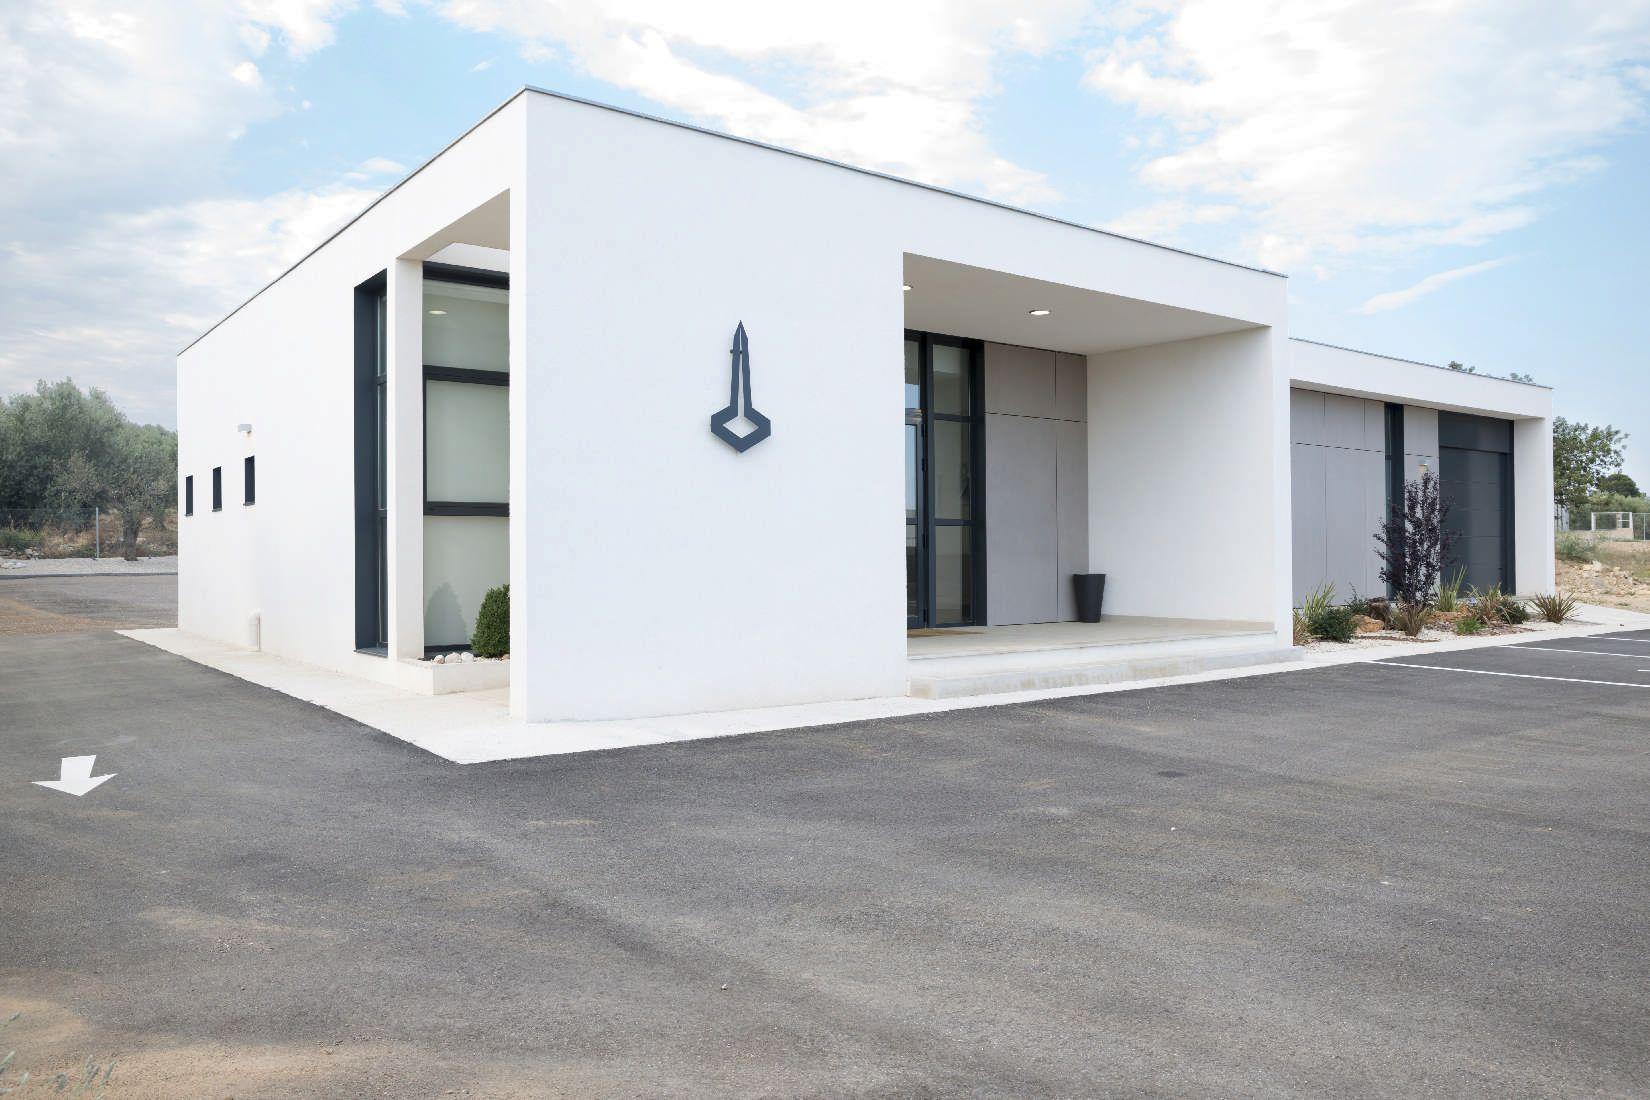 Cases d 39 acer modulars sostenibles cases d 39 acer - Casas prefabricadas sostenibles ...